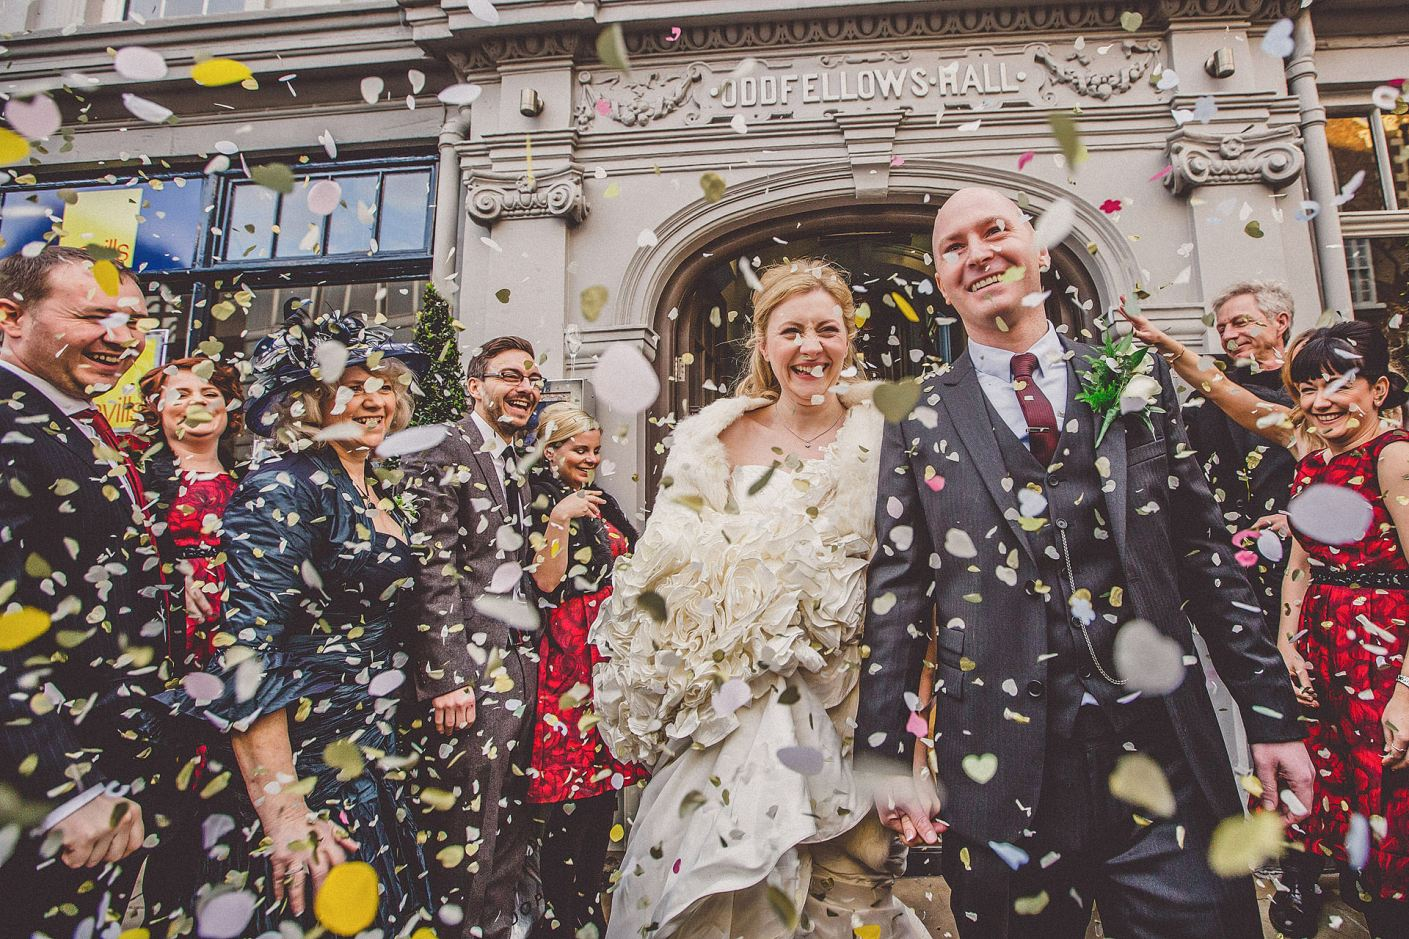 Wedding at Oddfellows Chester